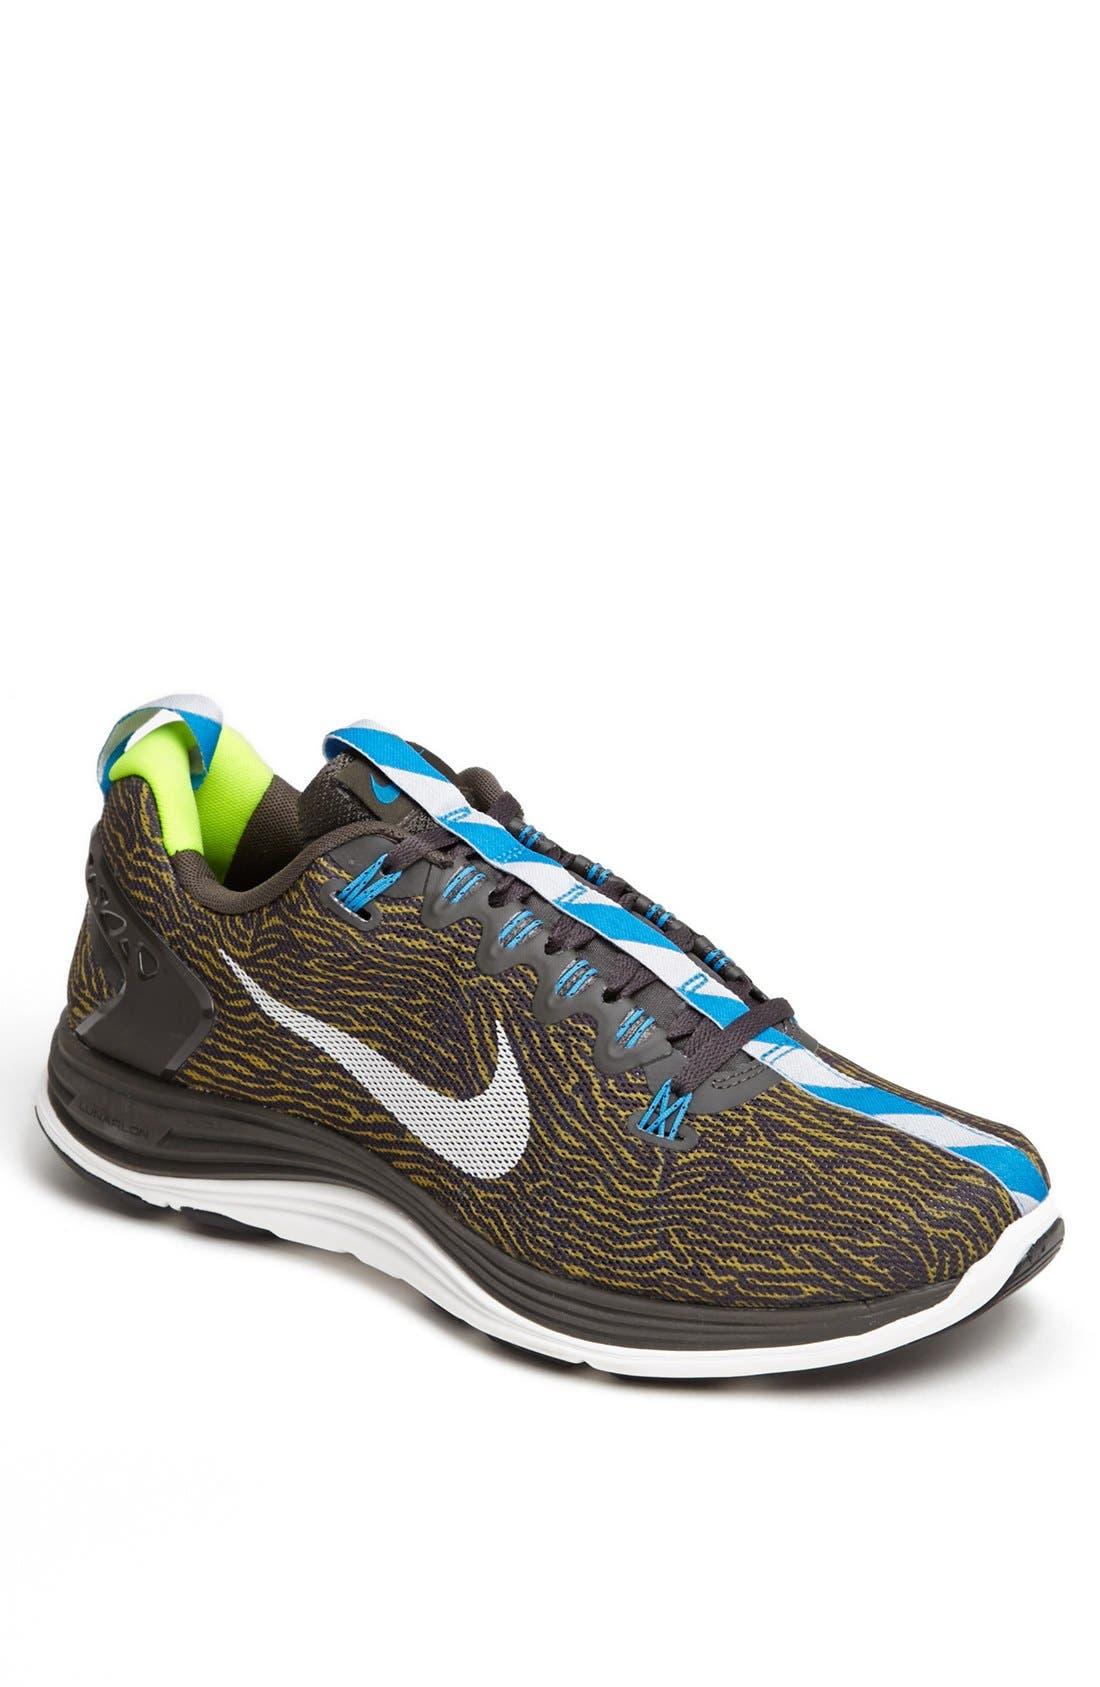 Main Image - Nike 'LunarGlide+ 5 EXT Premium' Training Shoe